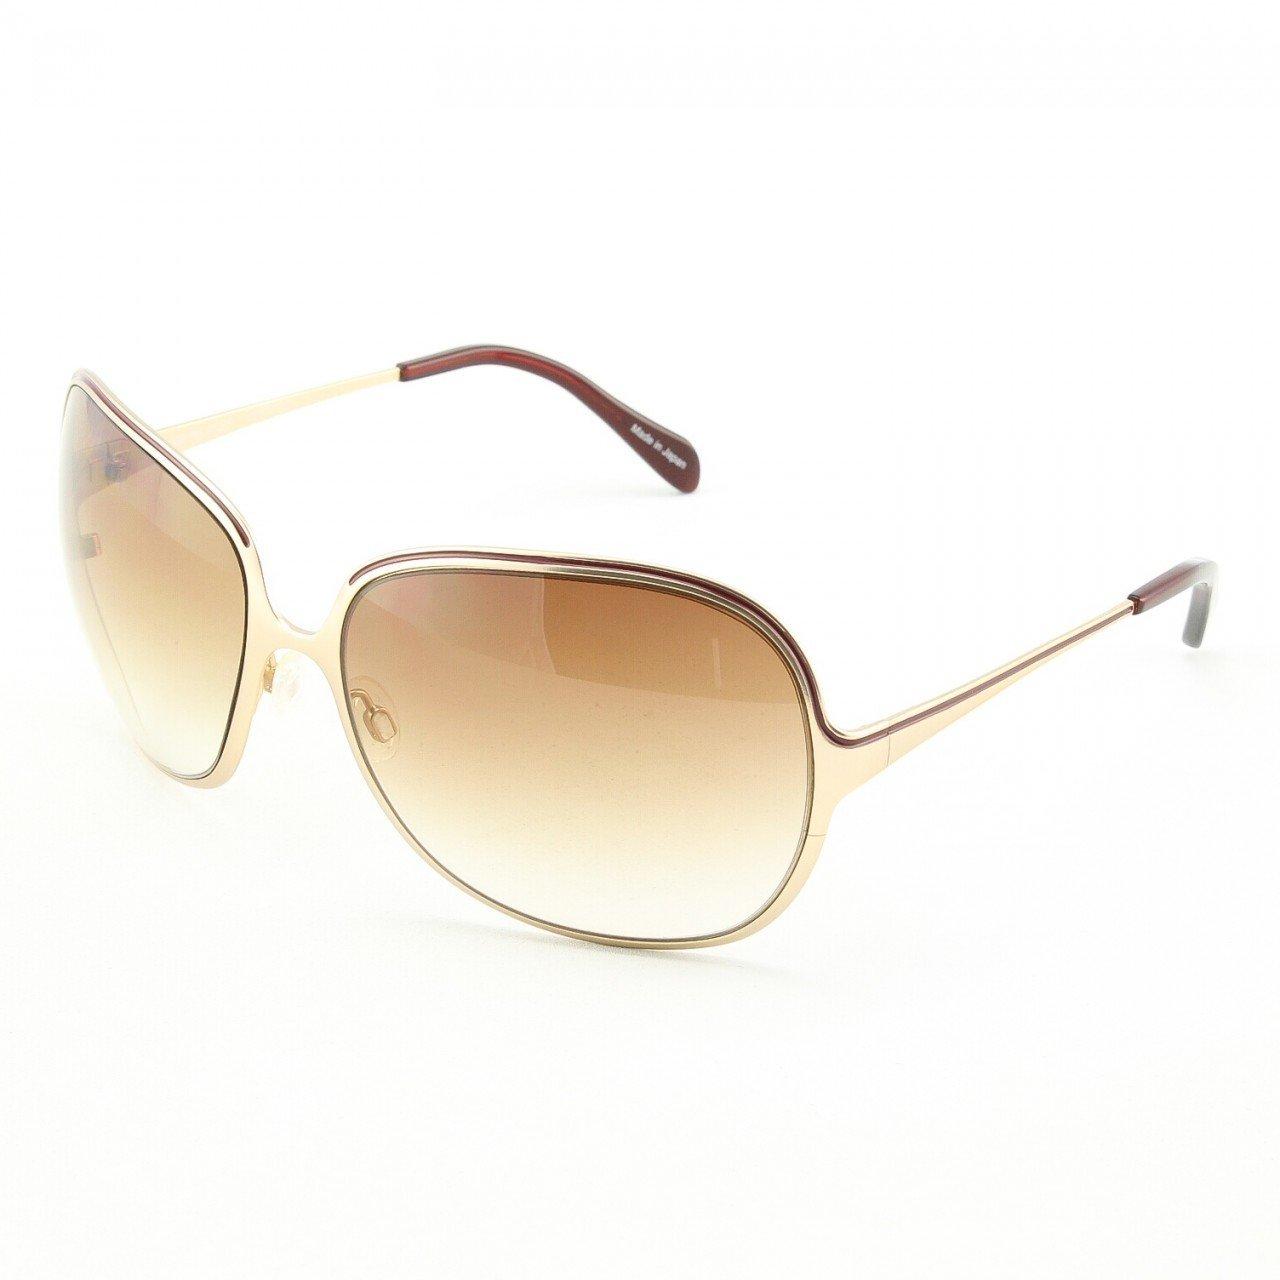 Oliver Peoples Vianca Sunglasses BG/COR-AMB Burgandy and Gold